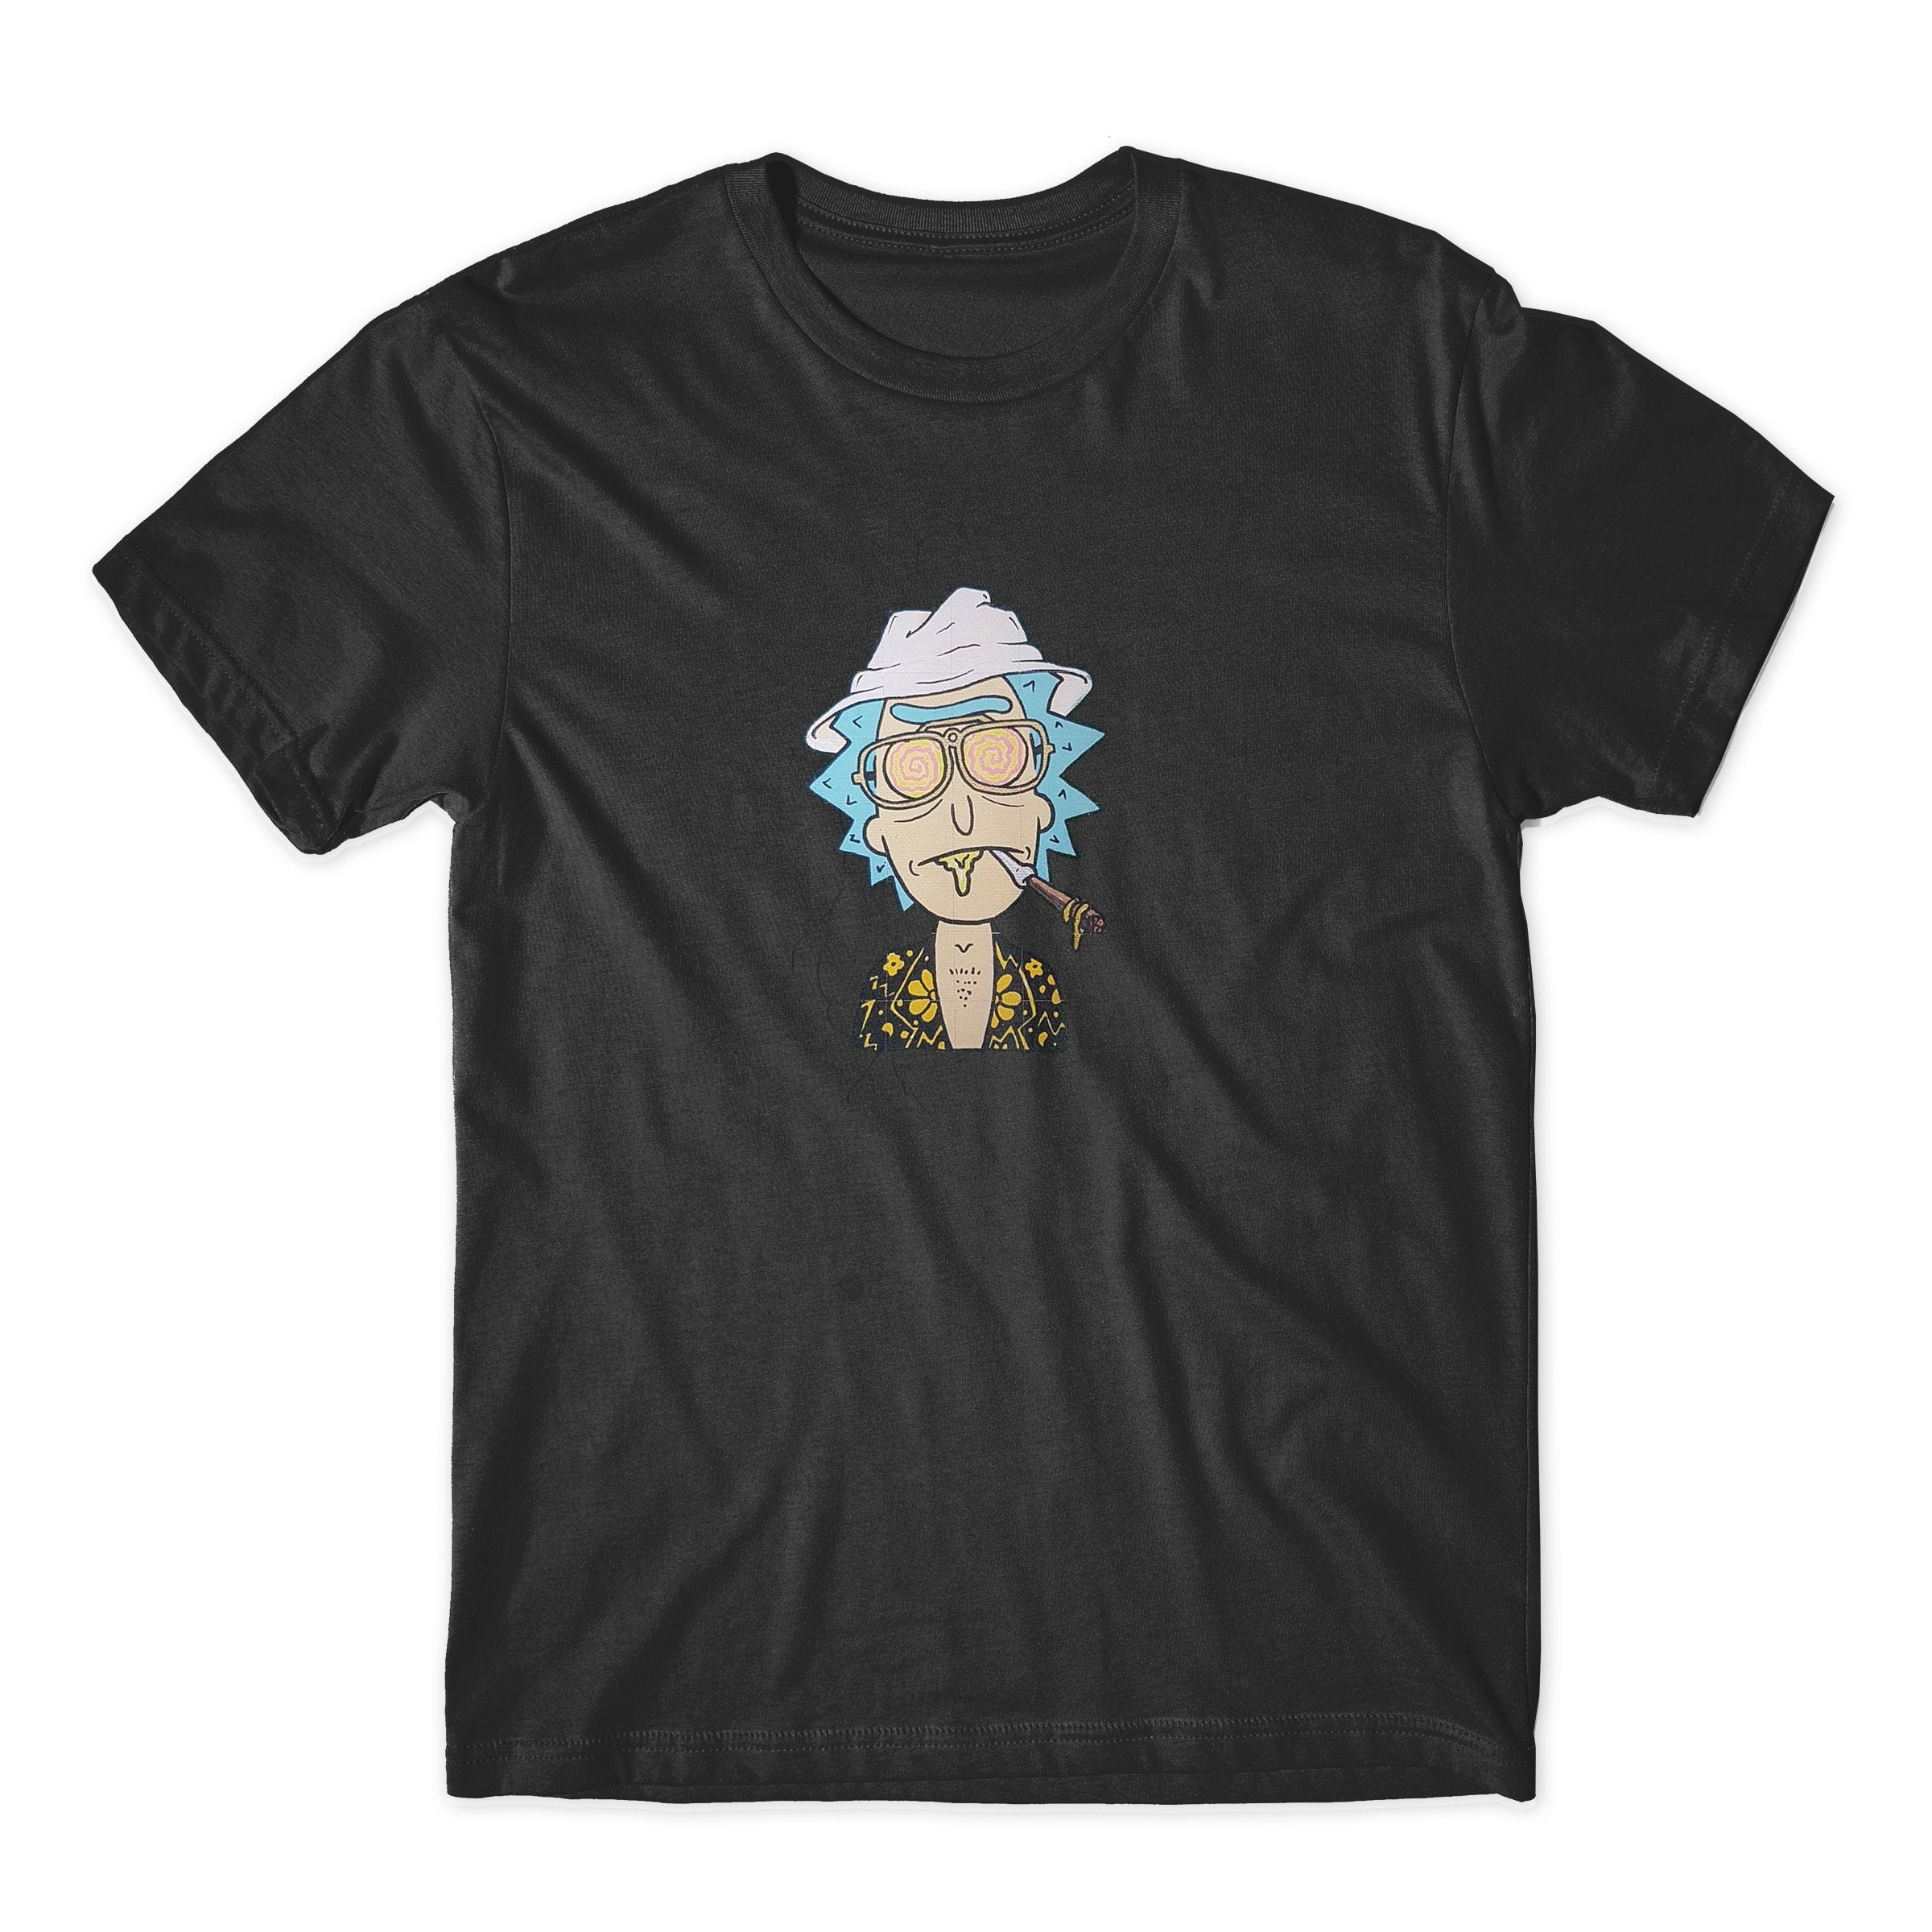 c5ae2b5449948 Bucket Hat Rick Rick and Morty T-shirt